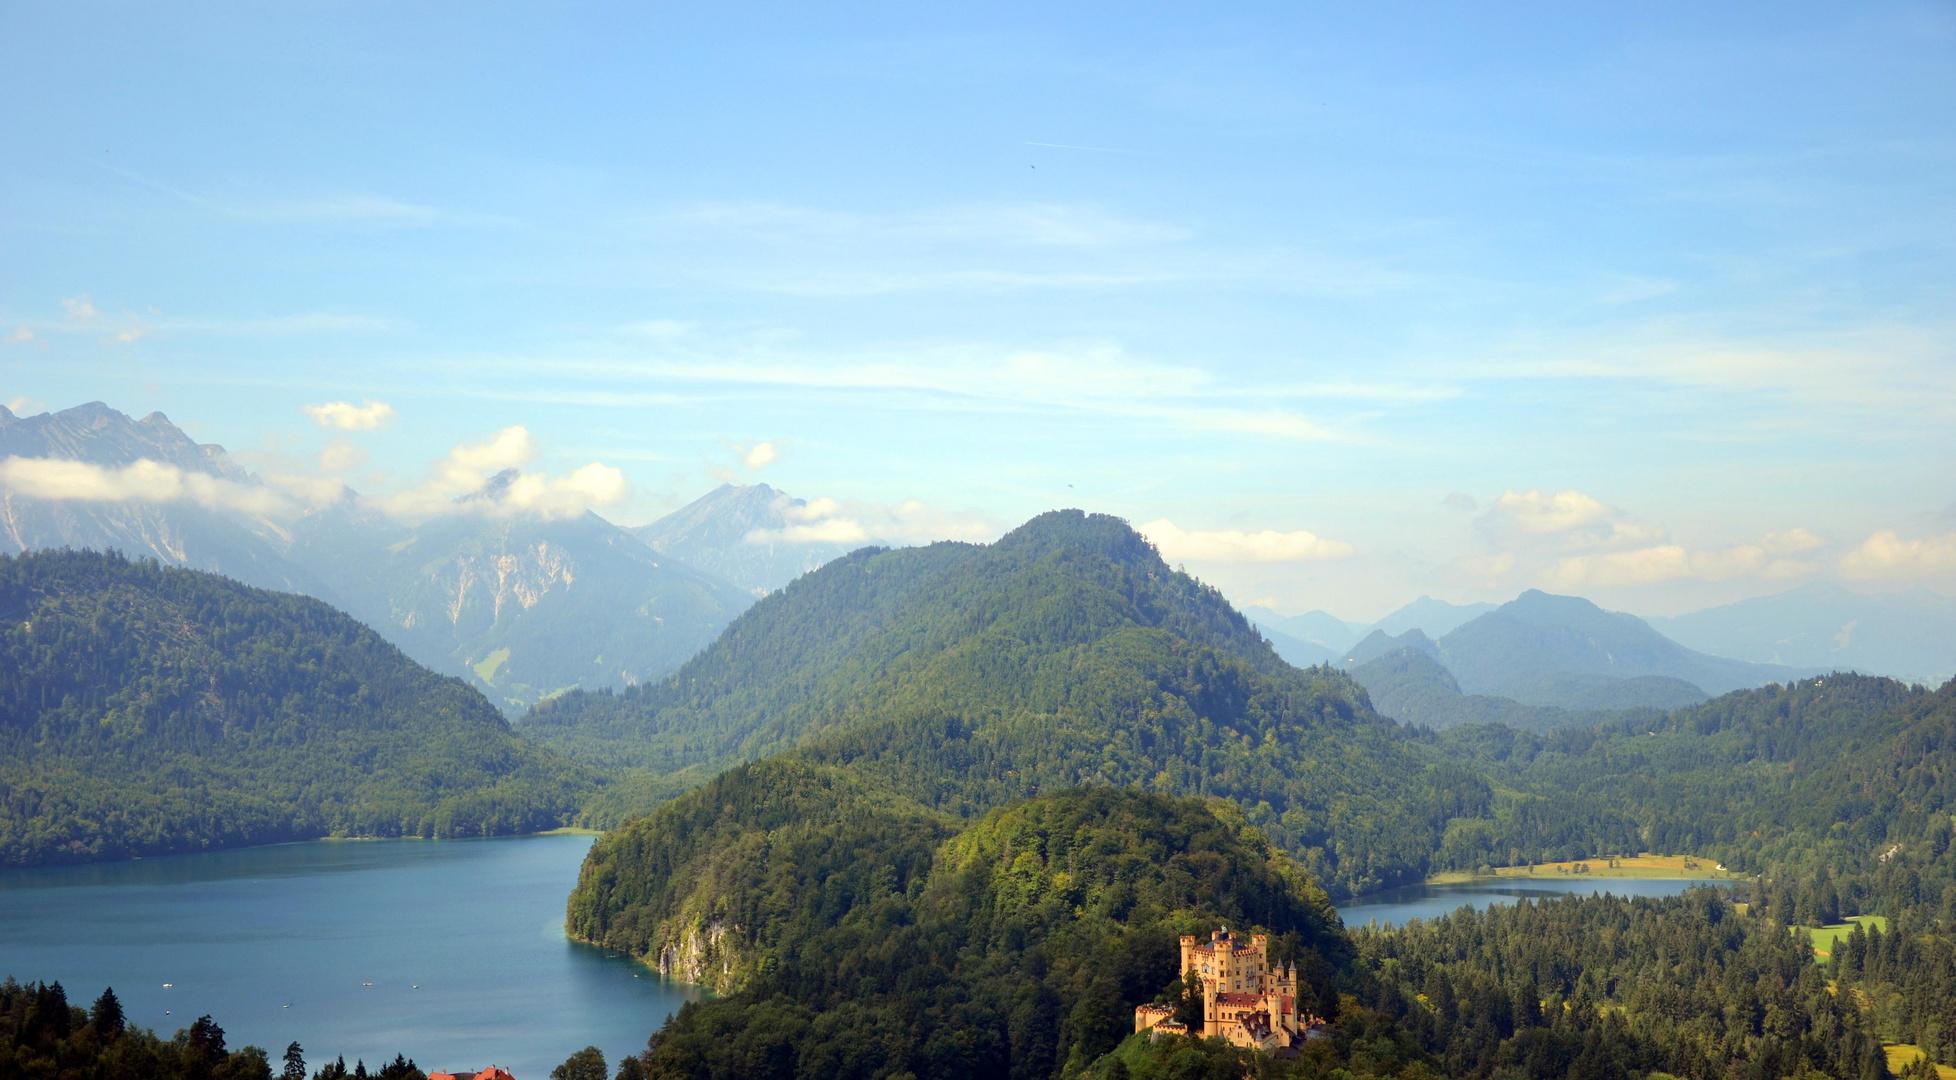 Blick auf den Alpsee in Hohenschwangau